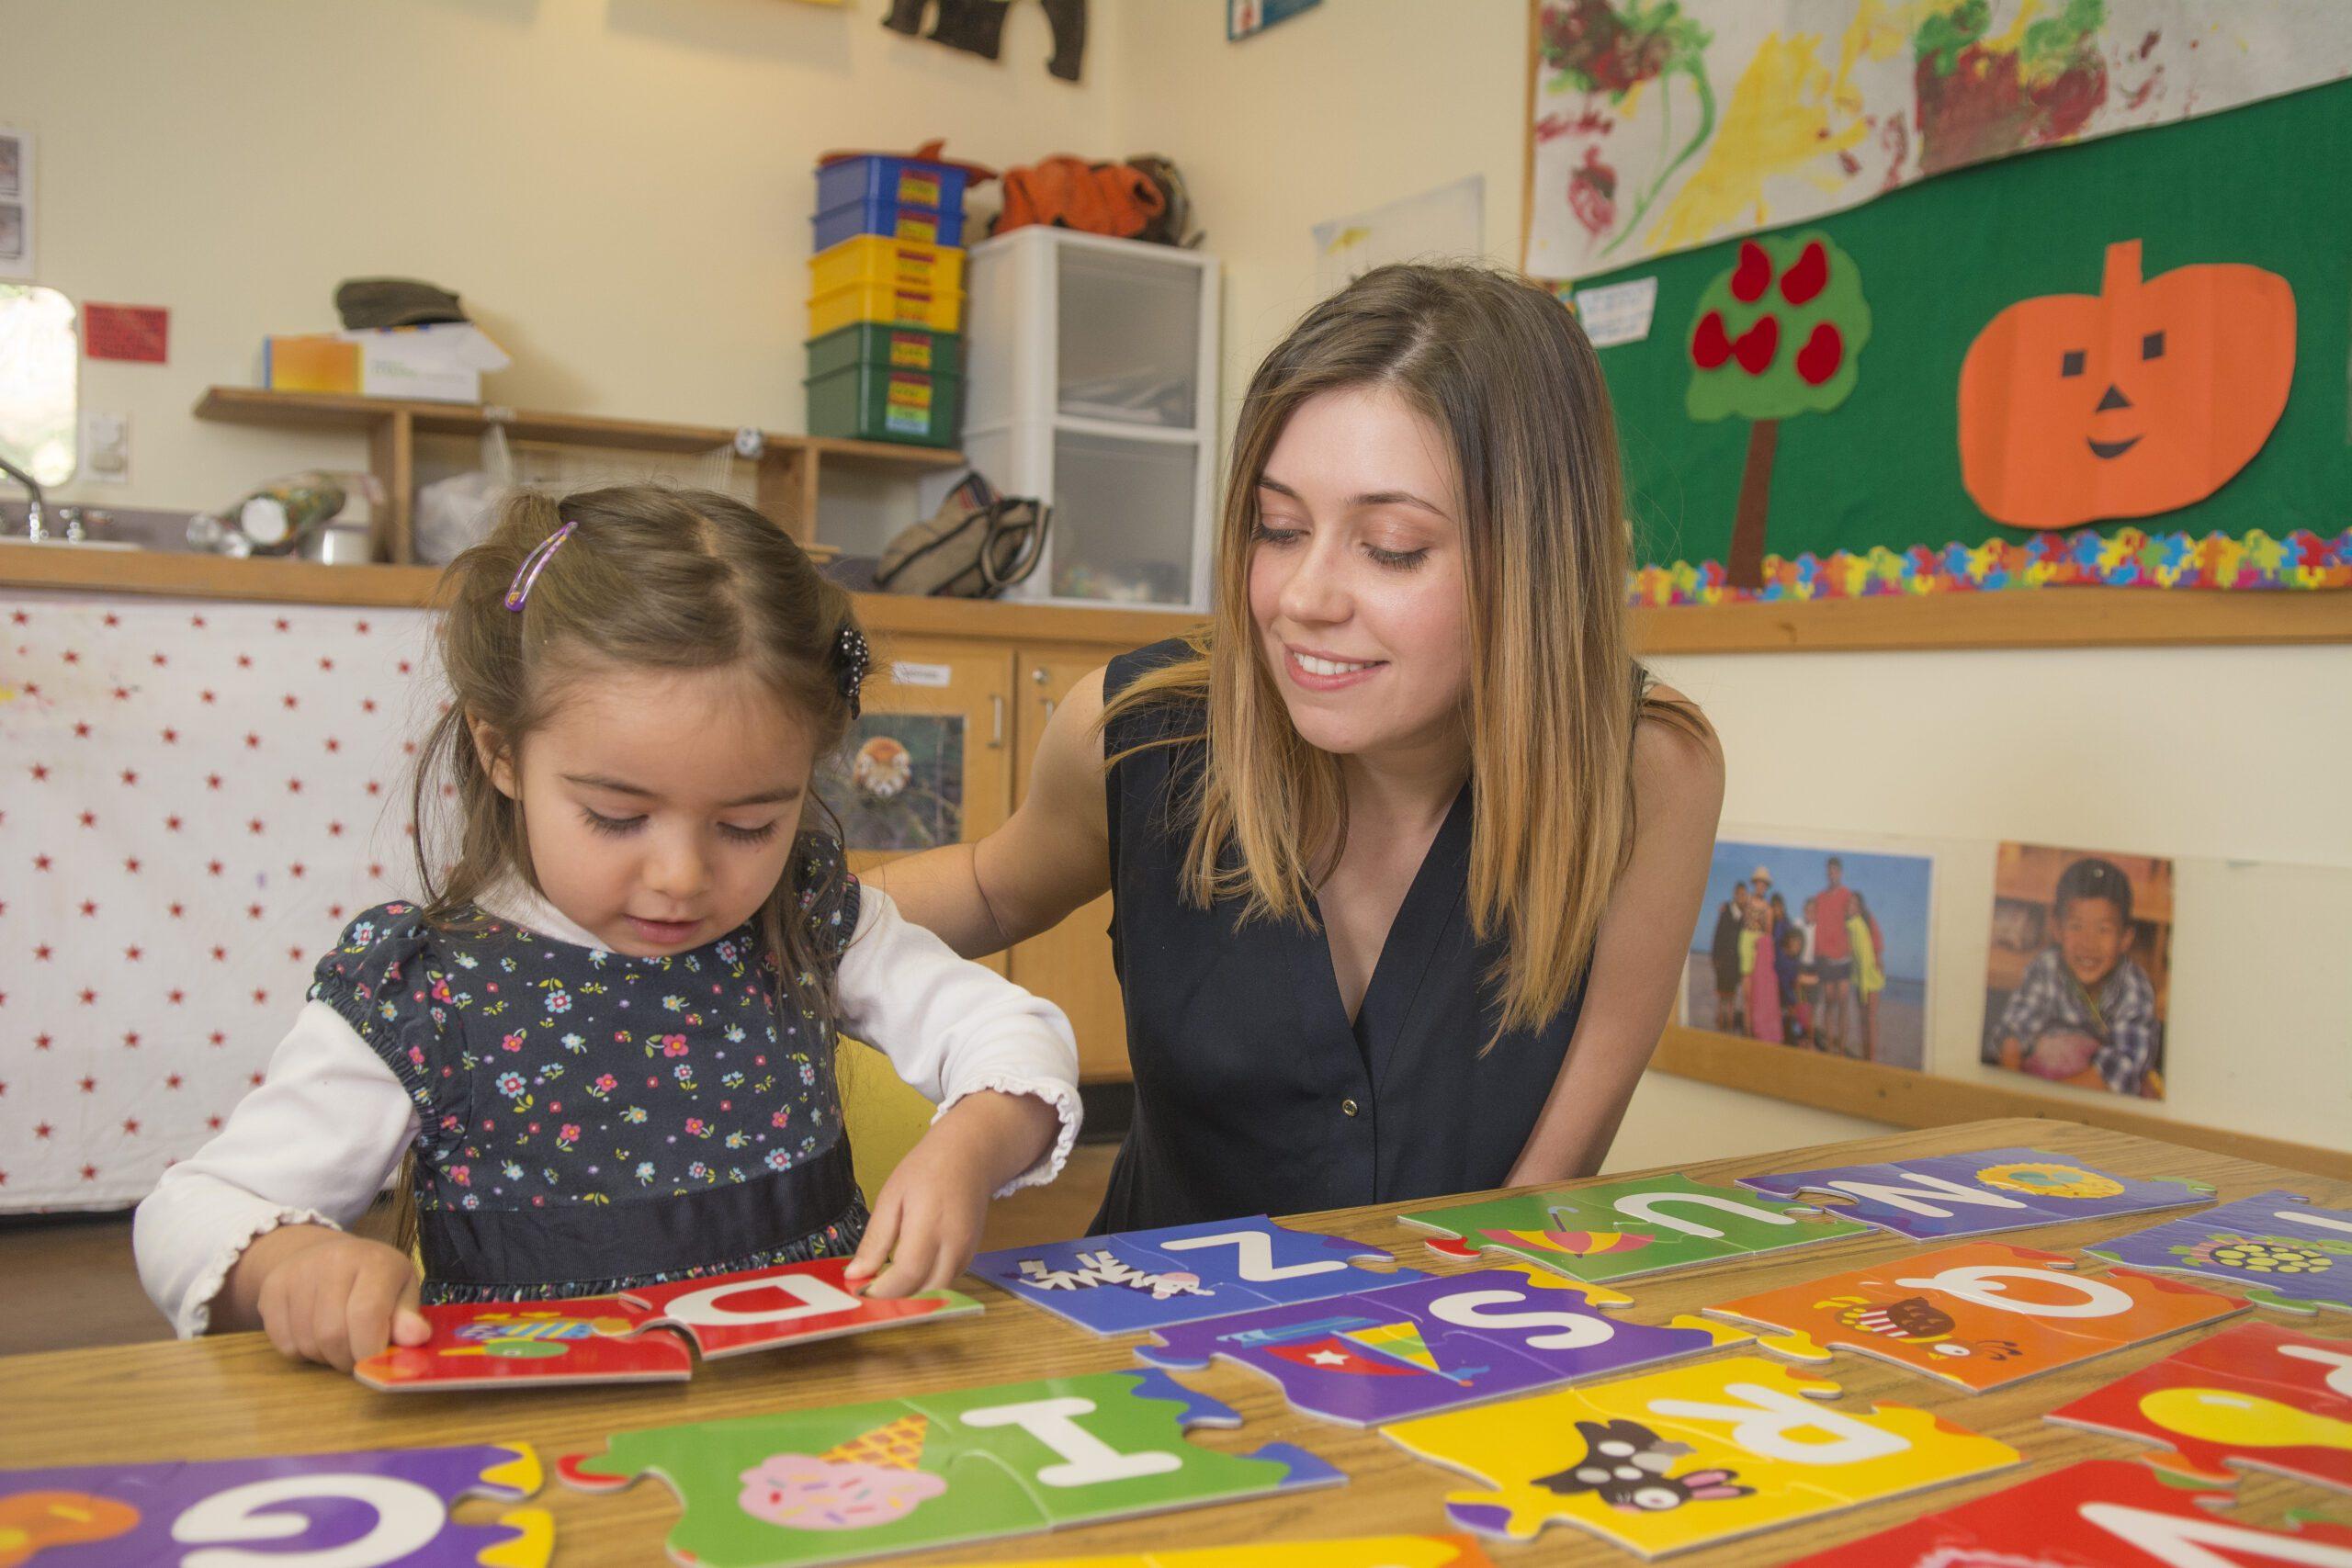 preschool teacher reads a book with a young girl